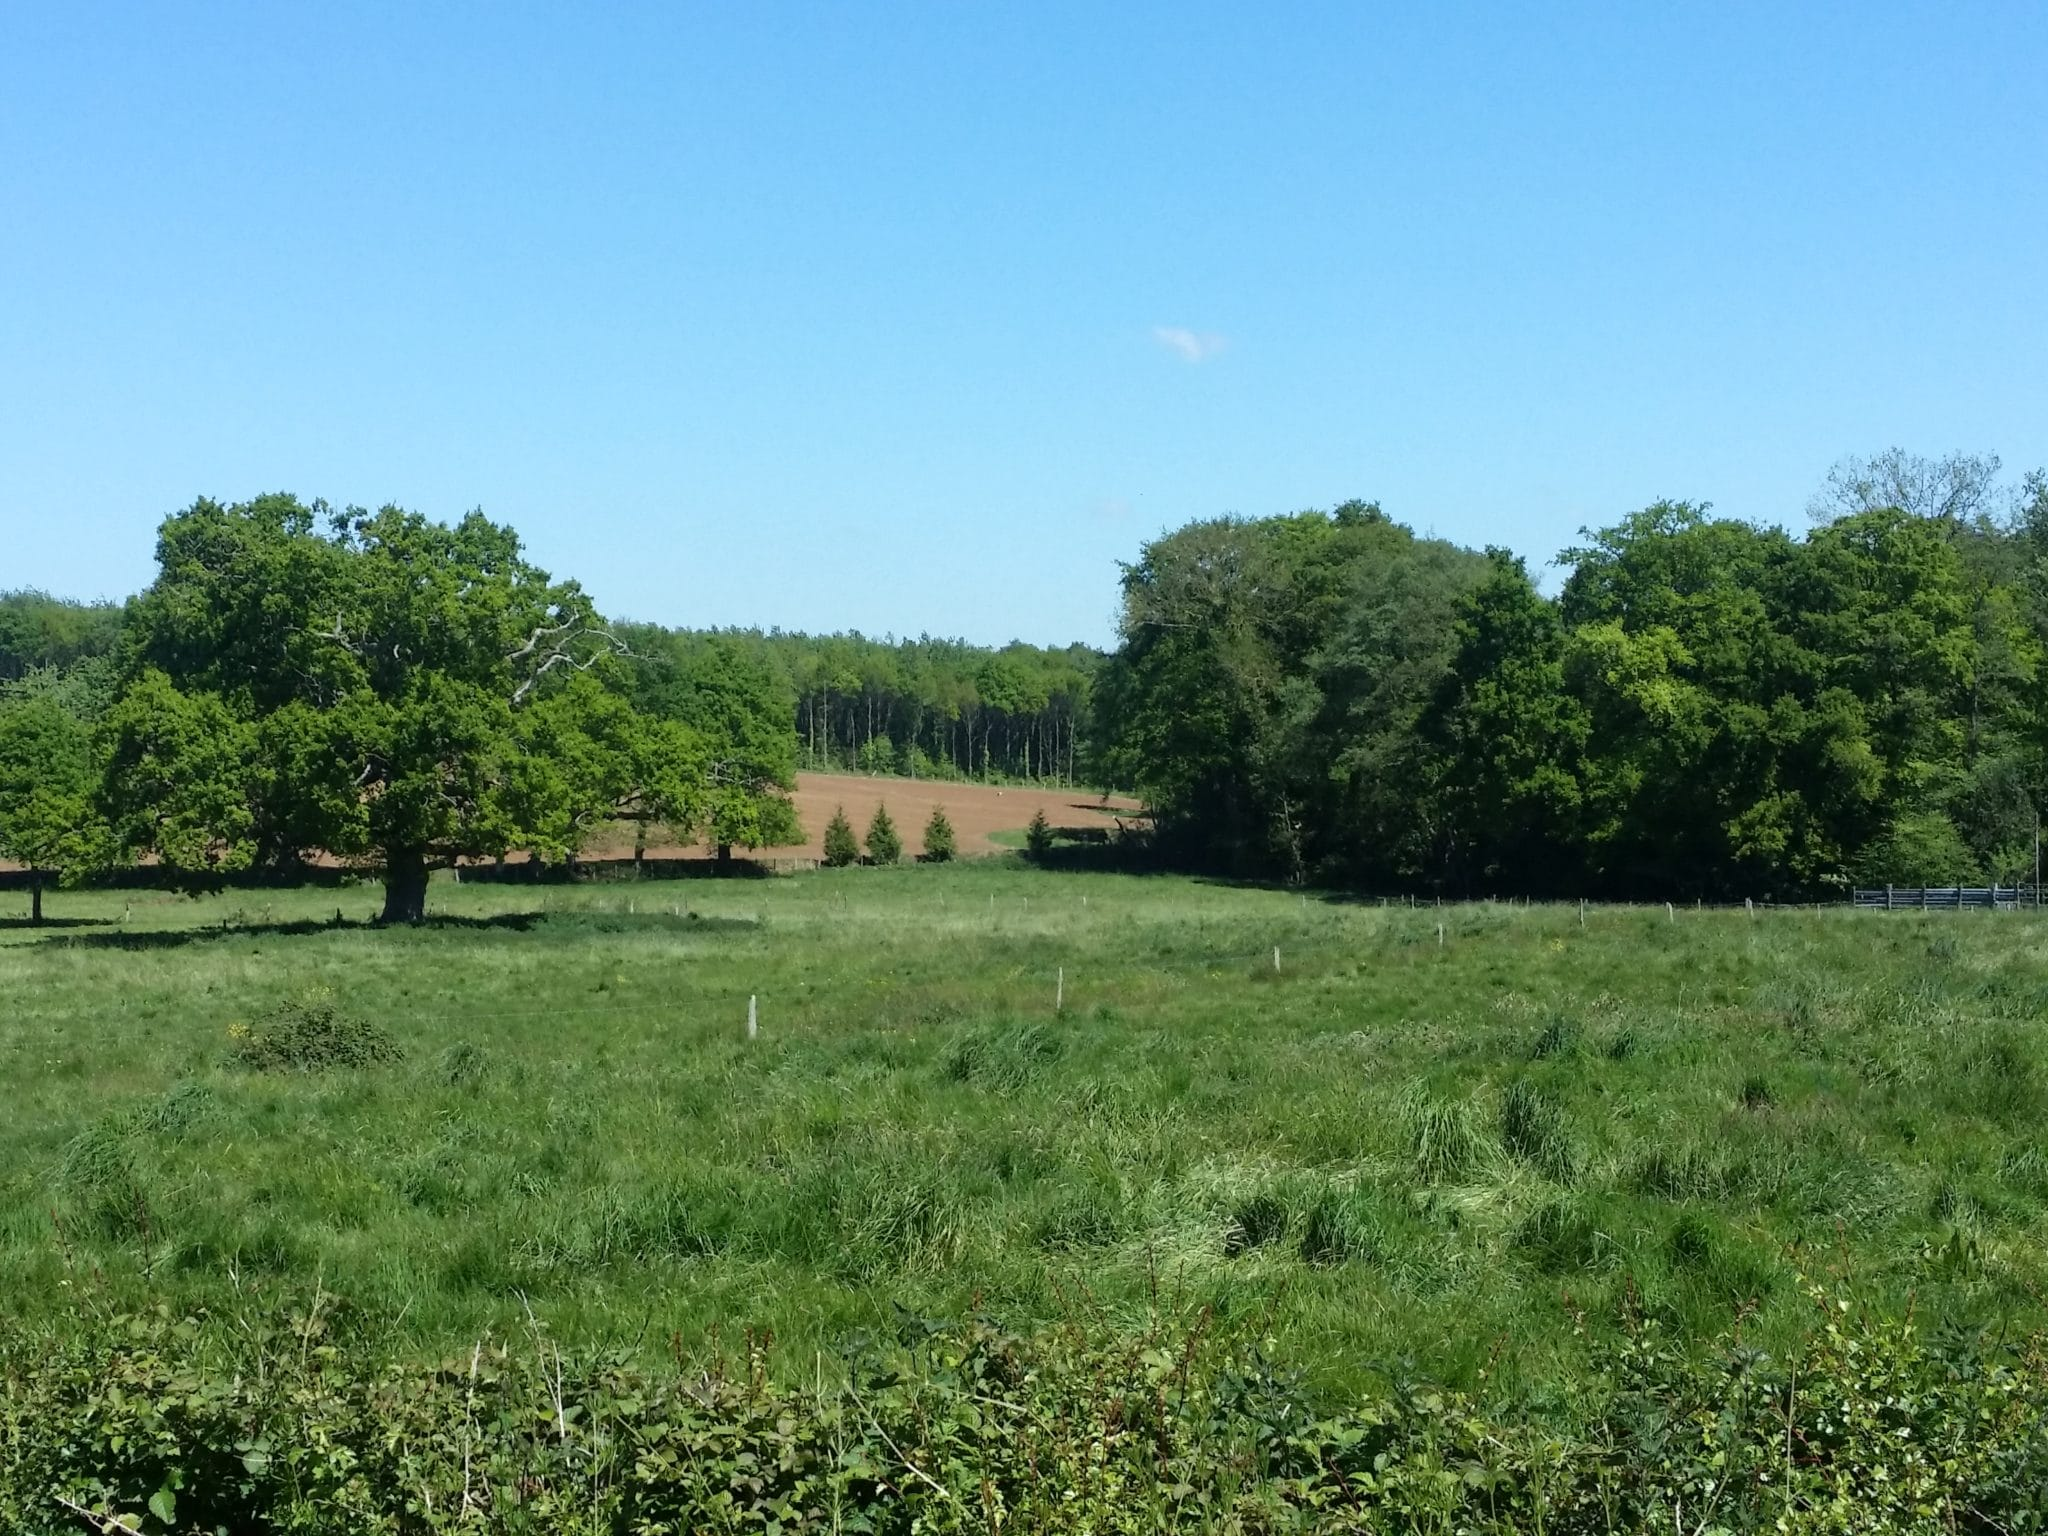 paysage trame verte et bleue